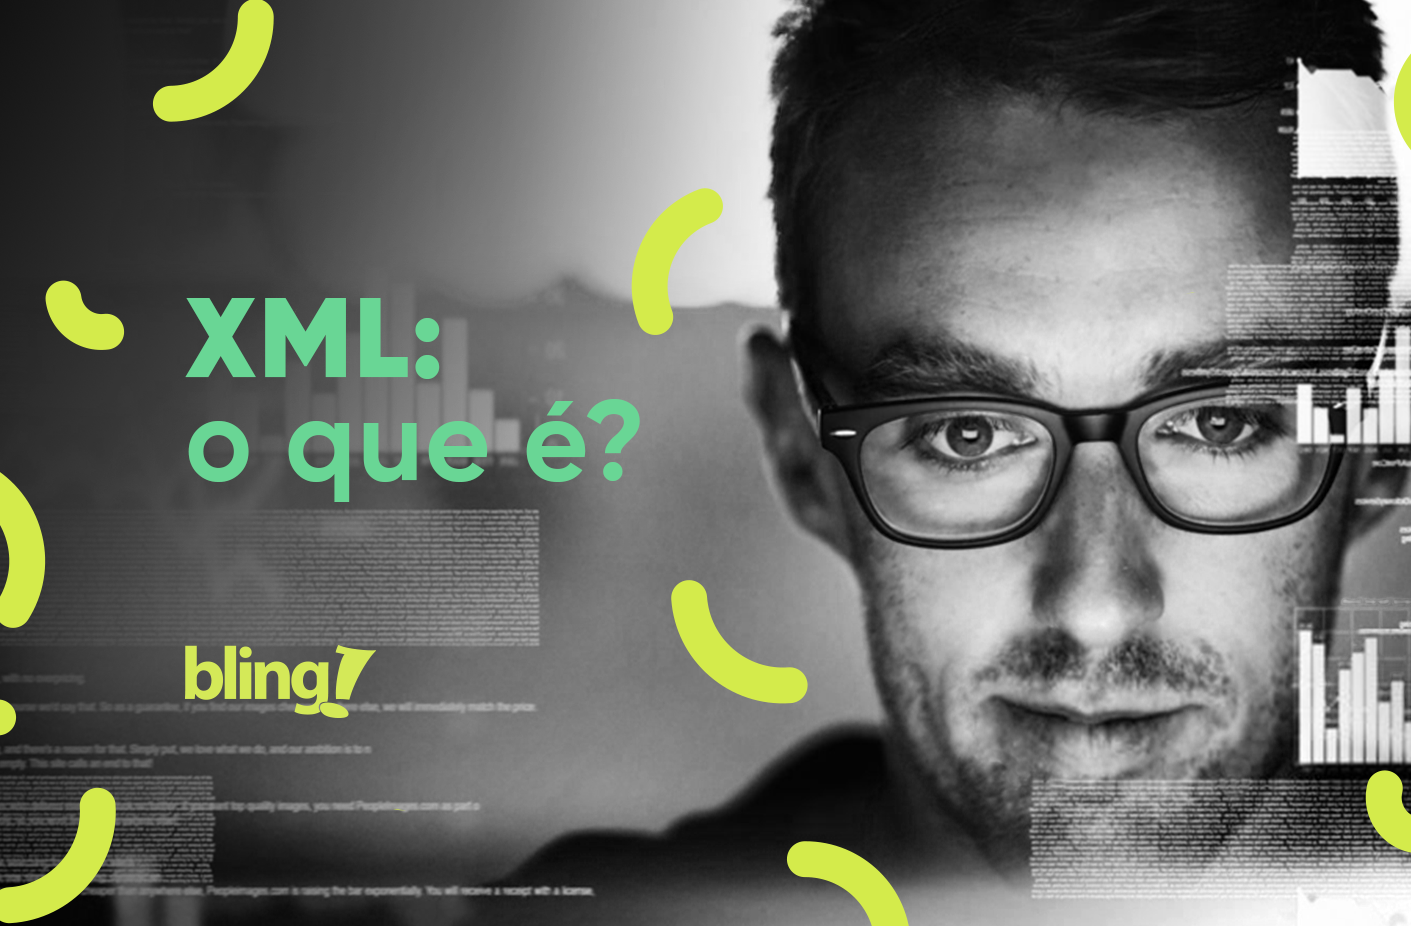 XML Nota Fiscal: entenda o que é, para que serve e benefícios